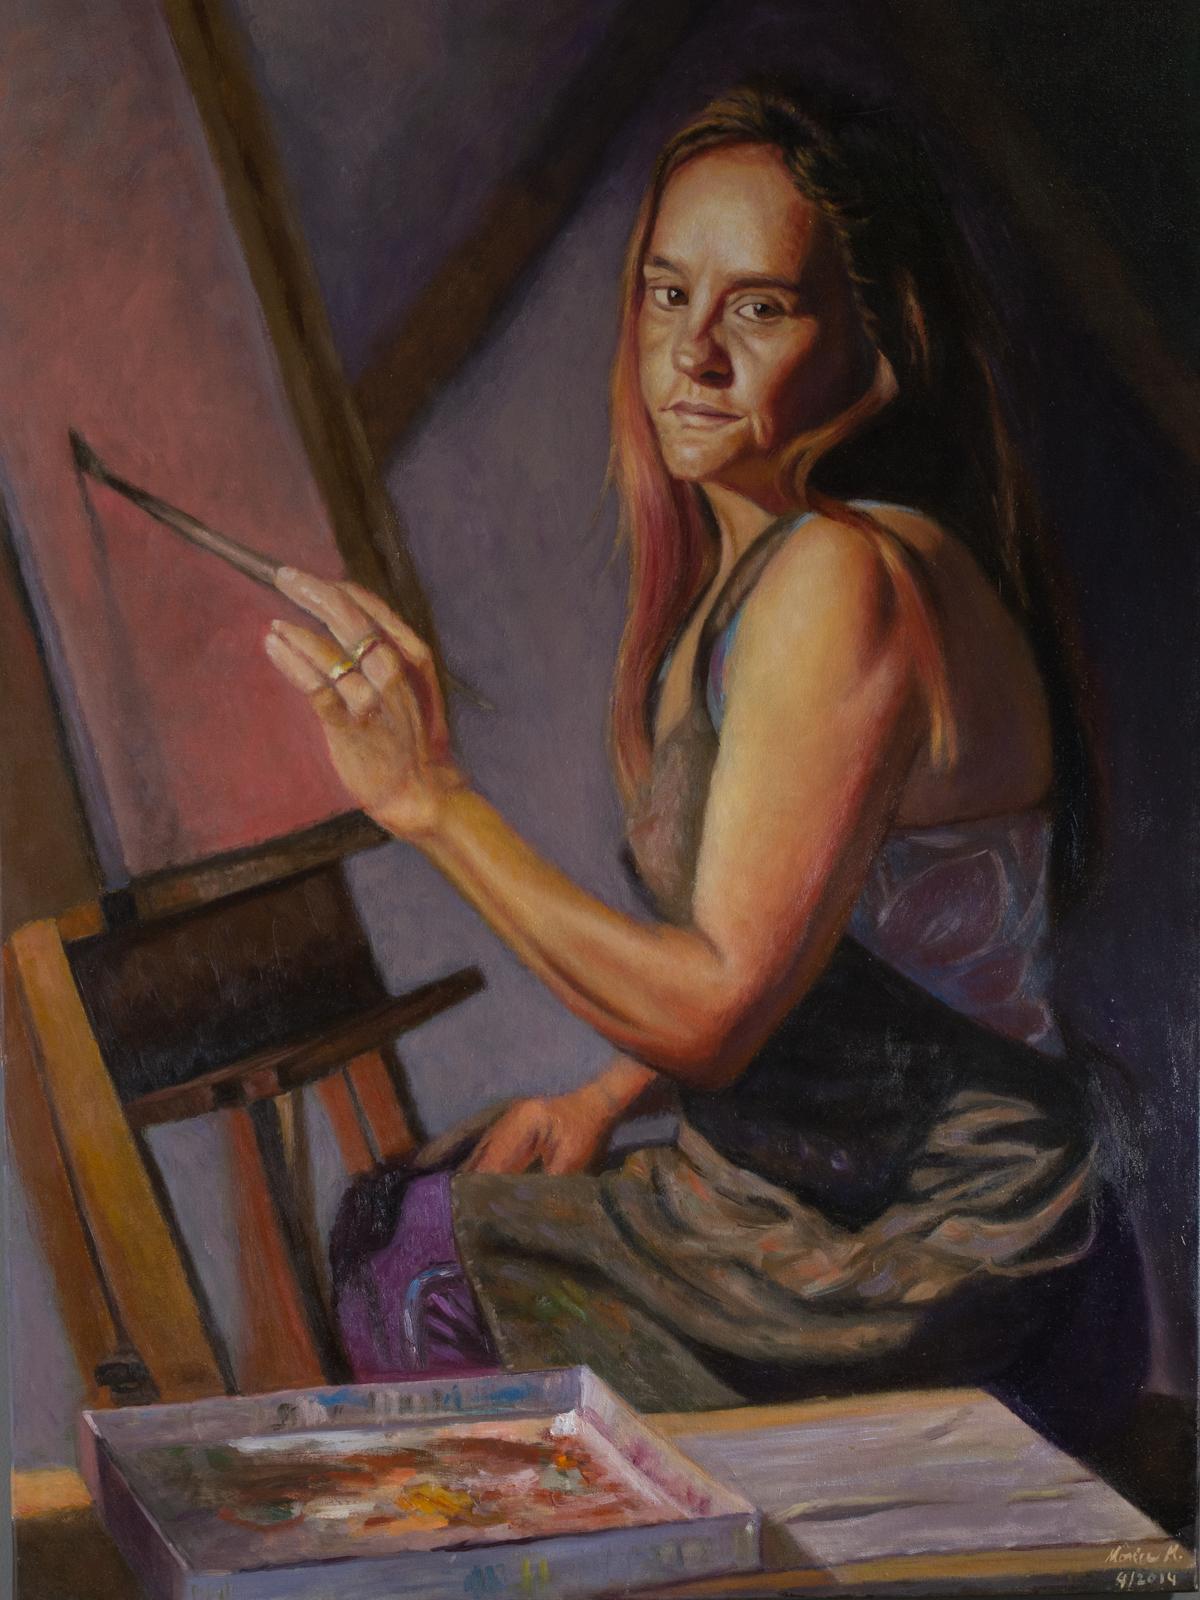 "Motivation - 45"" x 34"" - Oil on canvas"